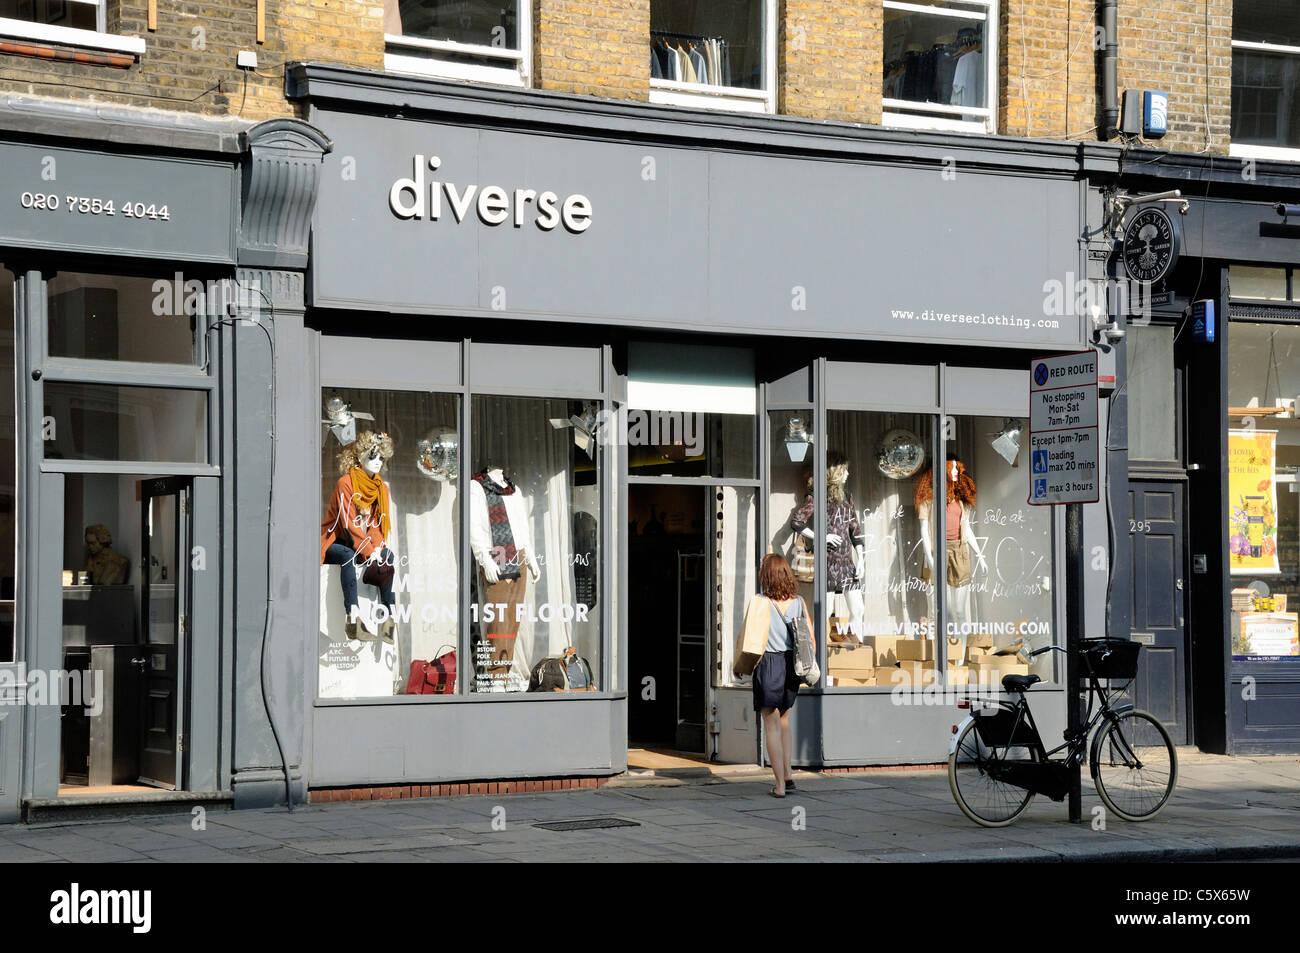 Lady walking into Diverse, Upper Street, Islington, London England UK - Stock Image